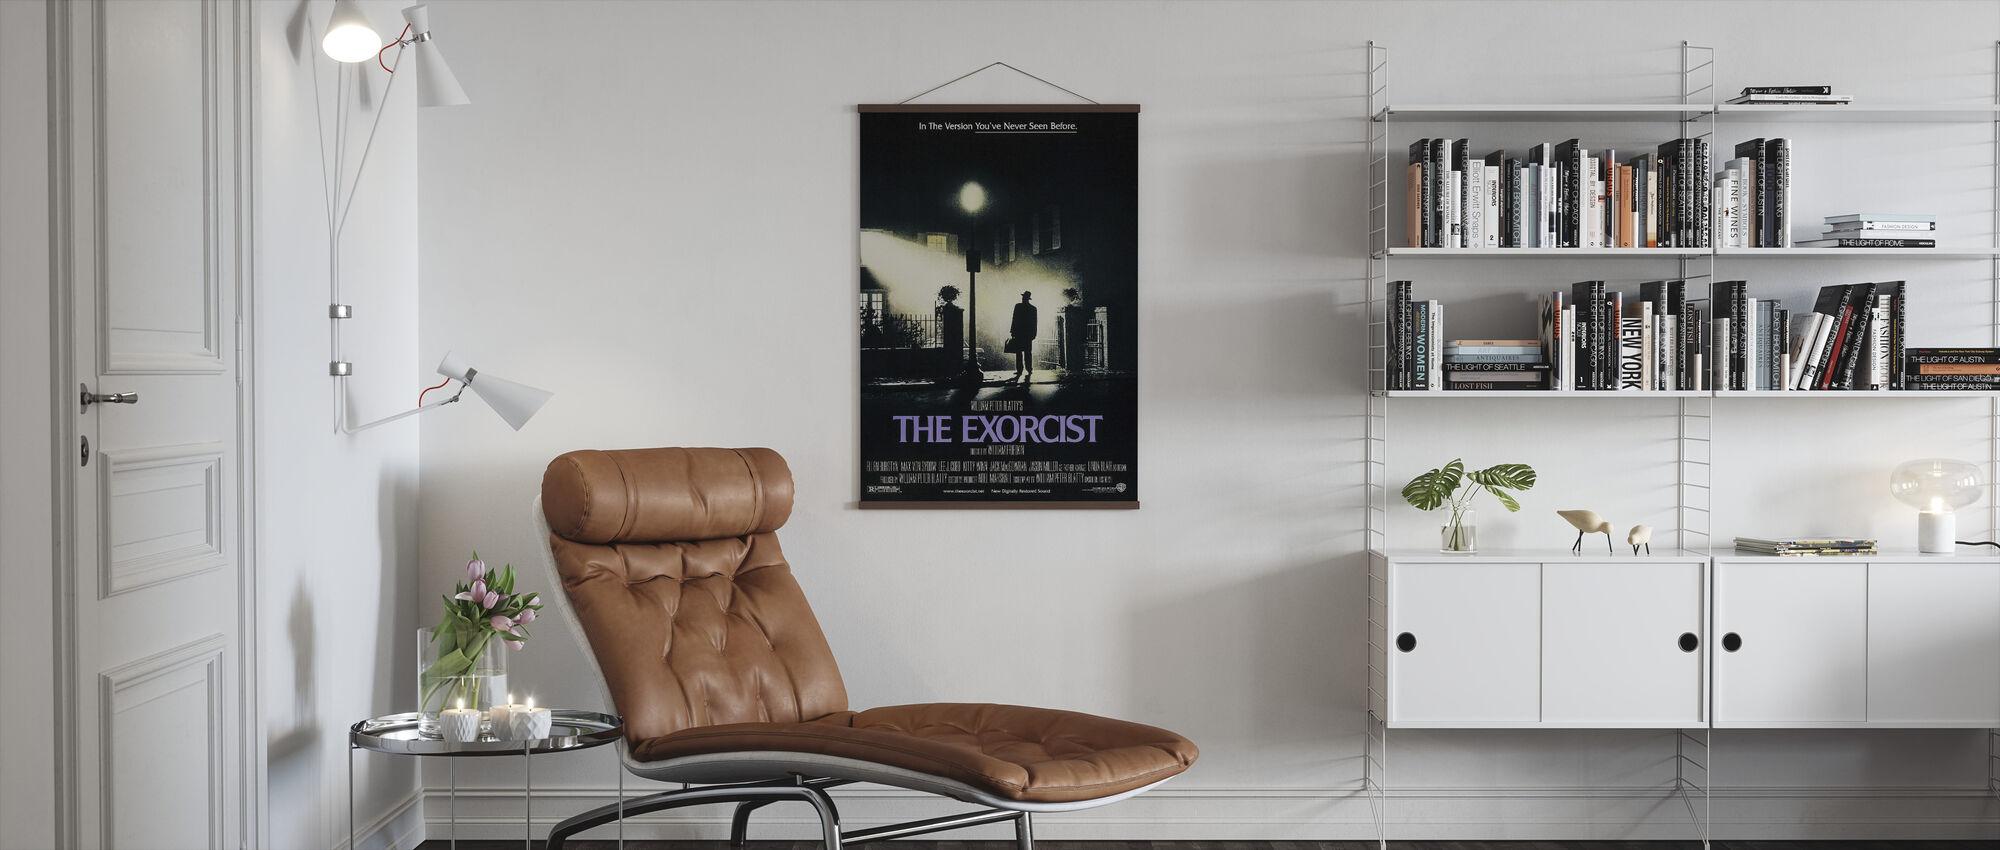 Eksorsist - Plakat - Stue